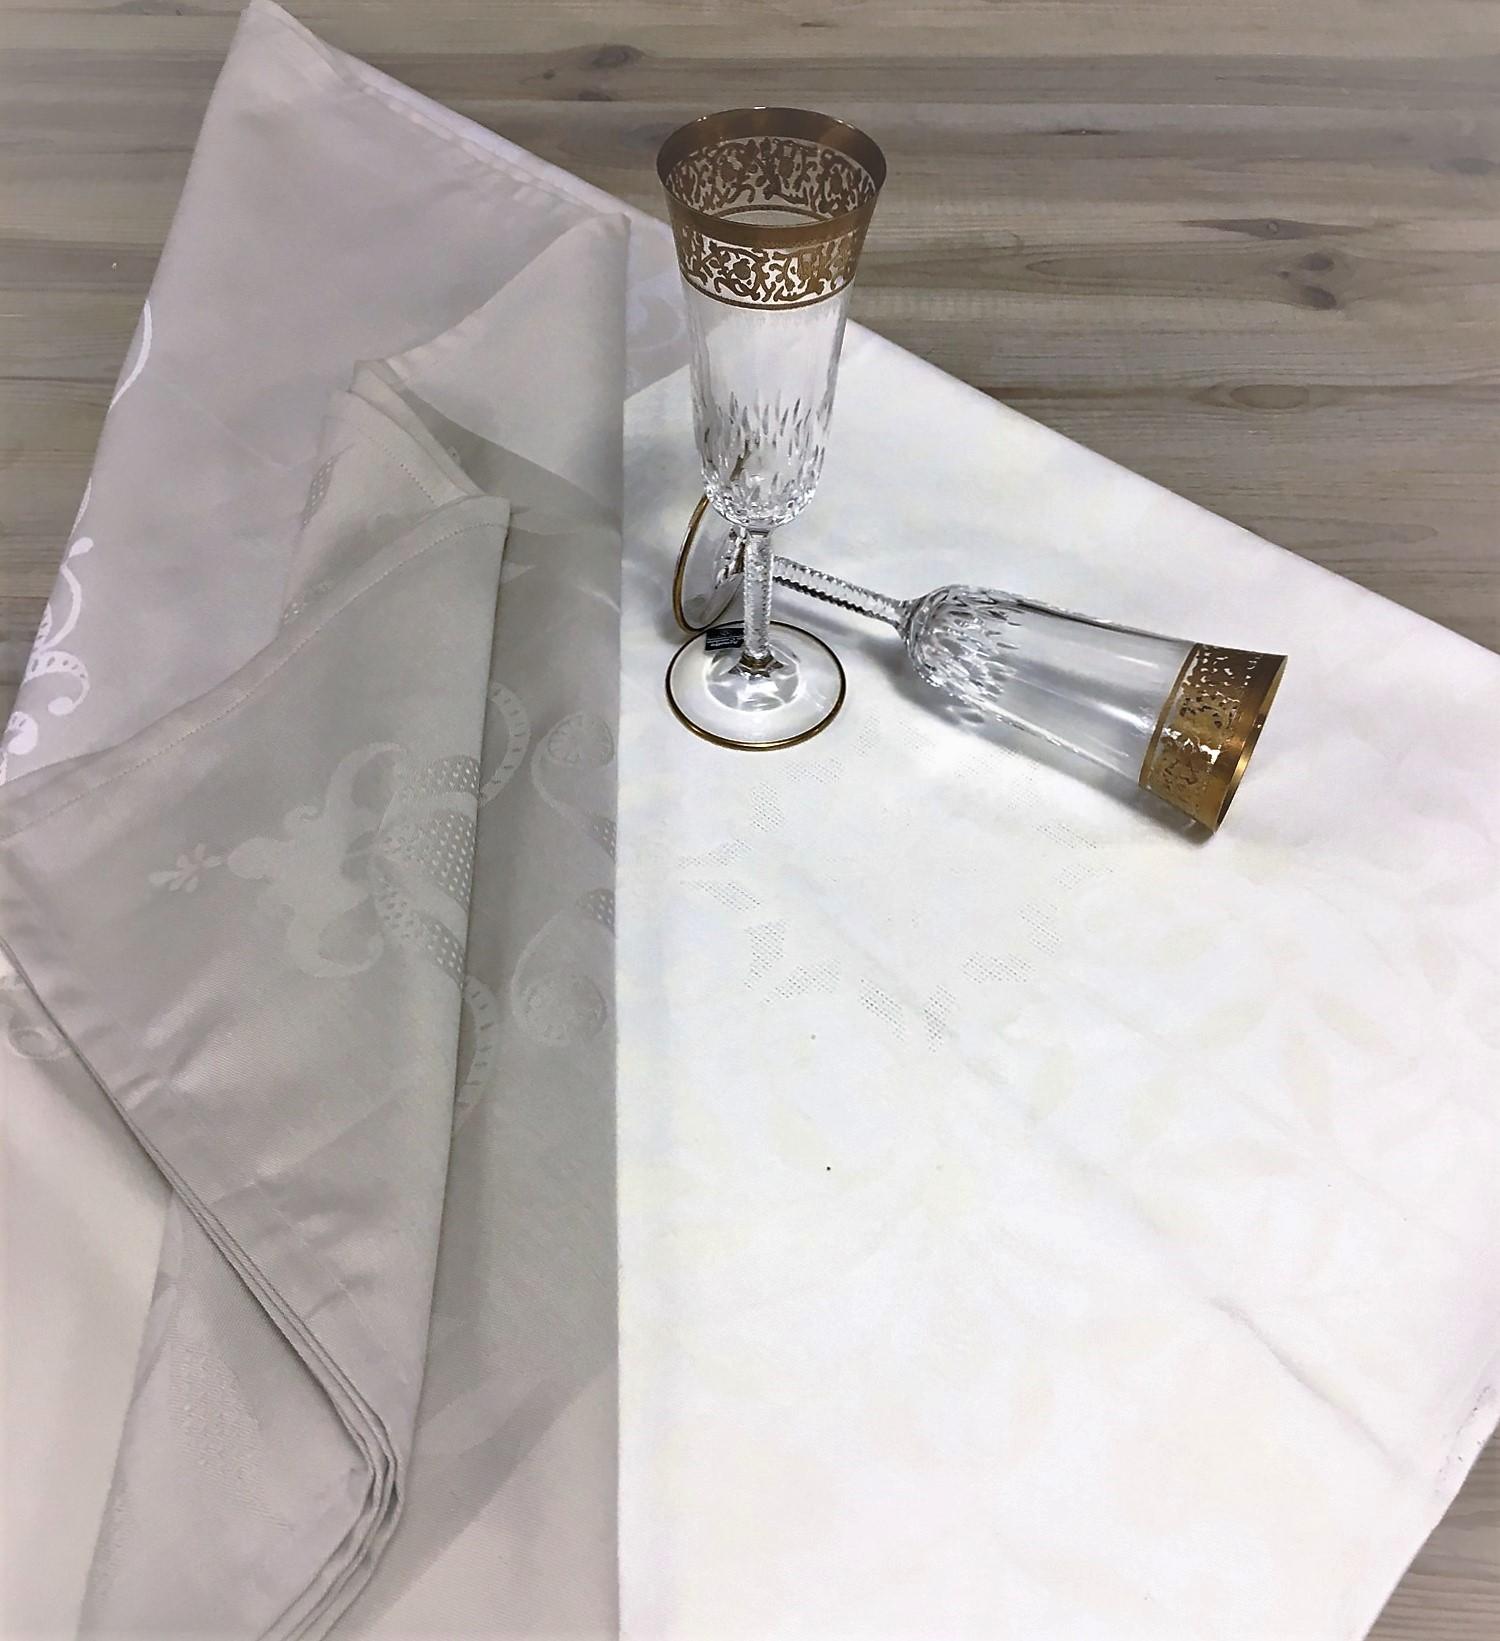 tovaglia venezia beigie bianca grigia